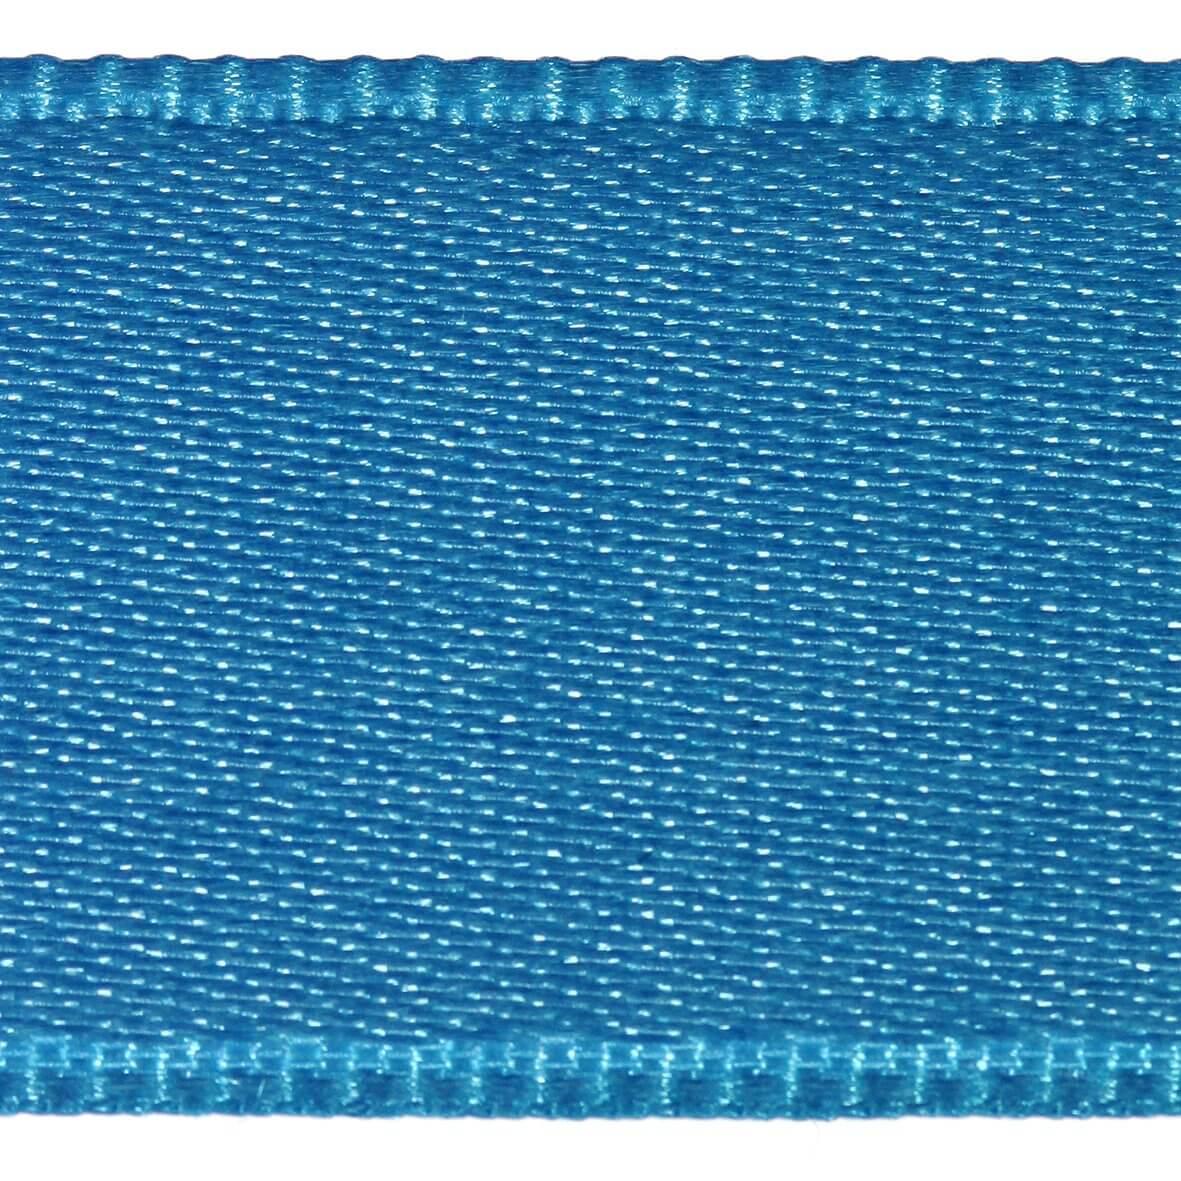 Imperial Turquoise Col. 318 - 3mm Satab Satin Ribbon